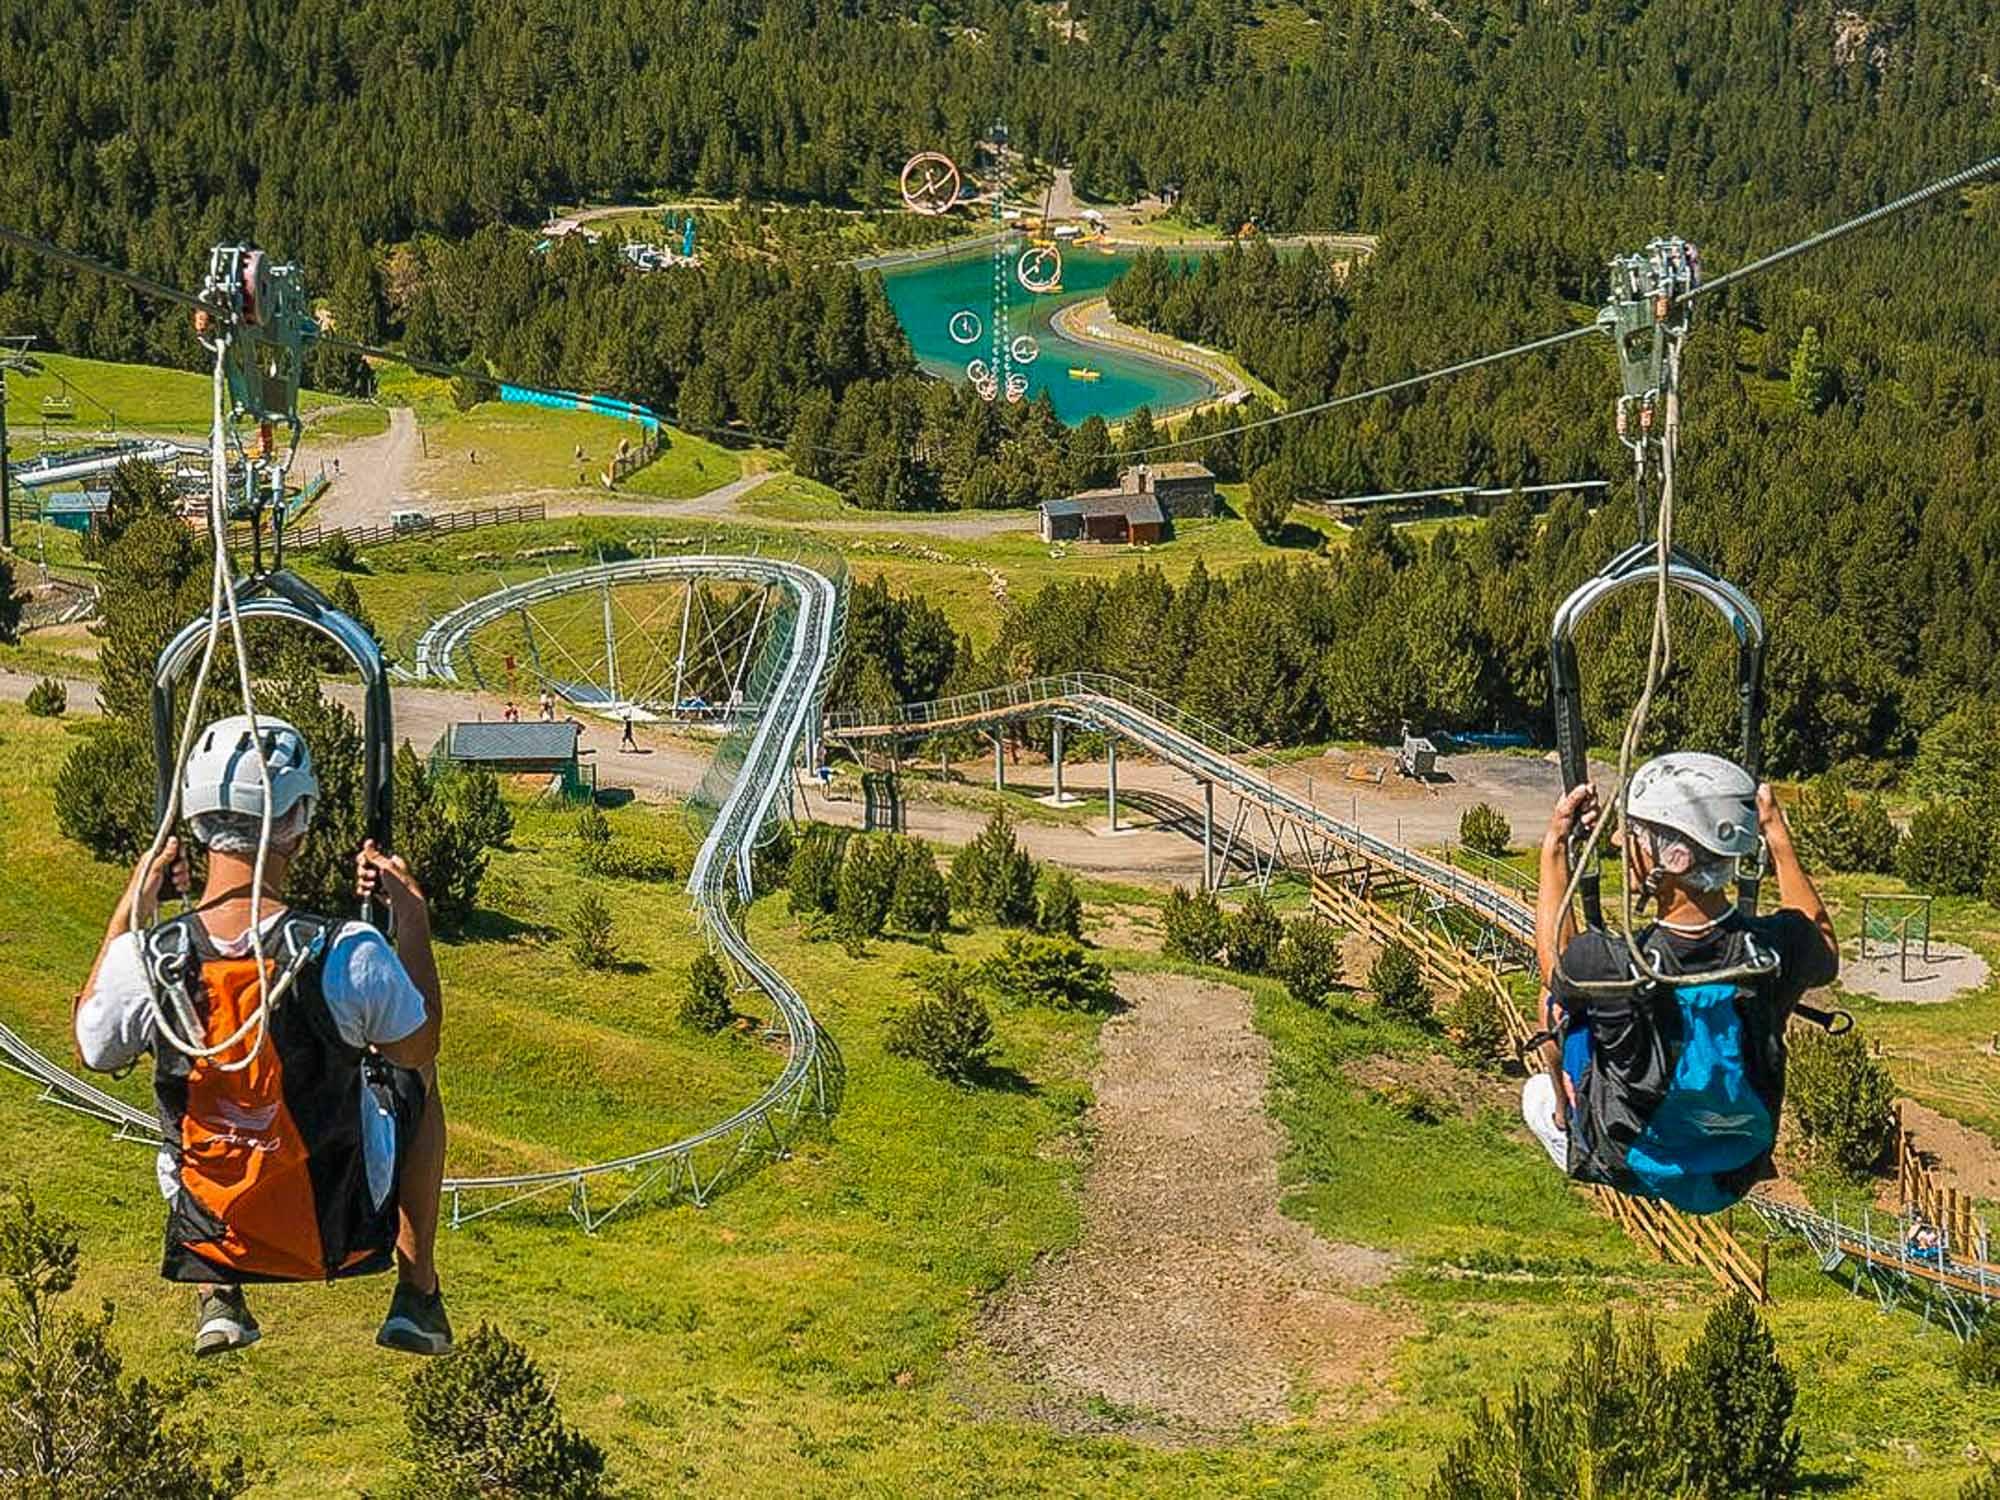 Tirolina de Mont Magic, Grandvalira, Andorra